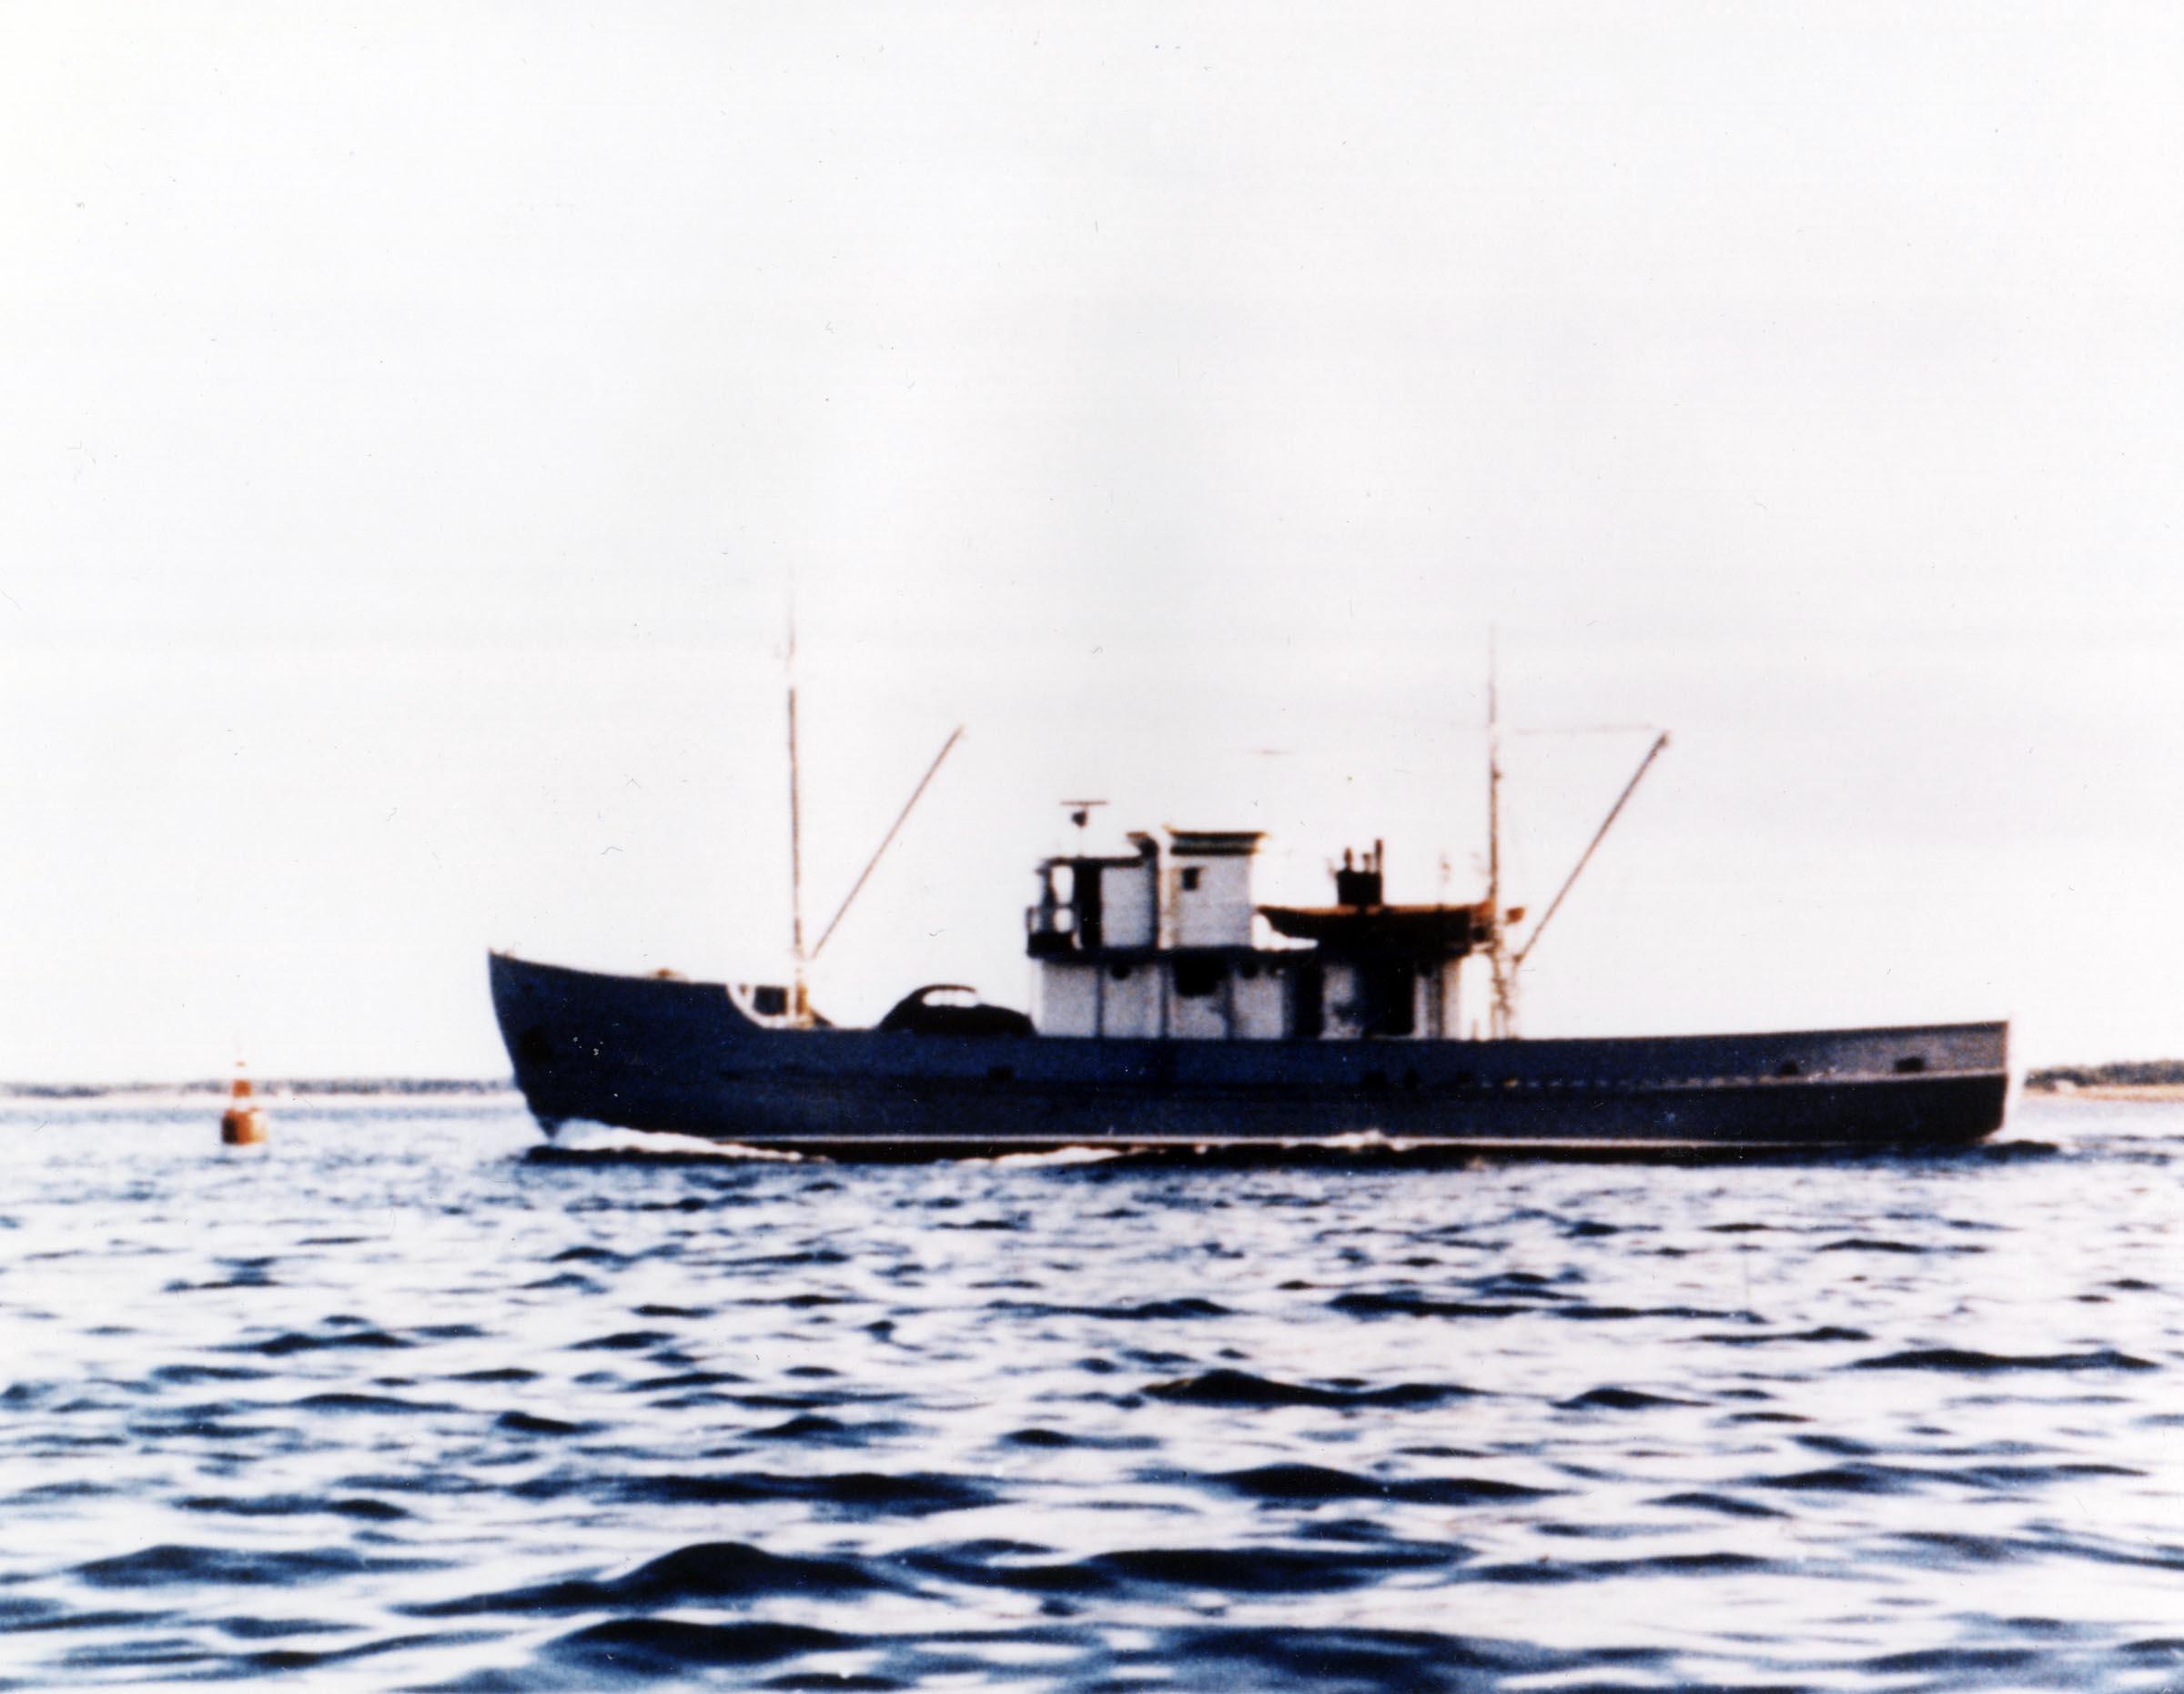 HMCS REVELSTOKE